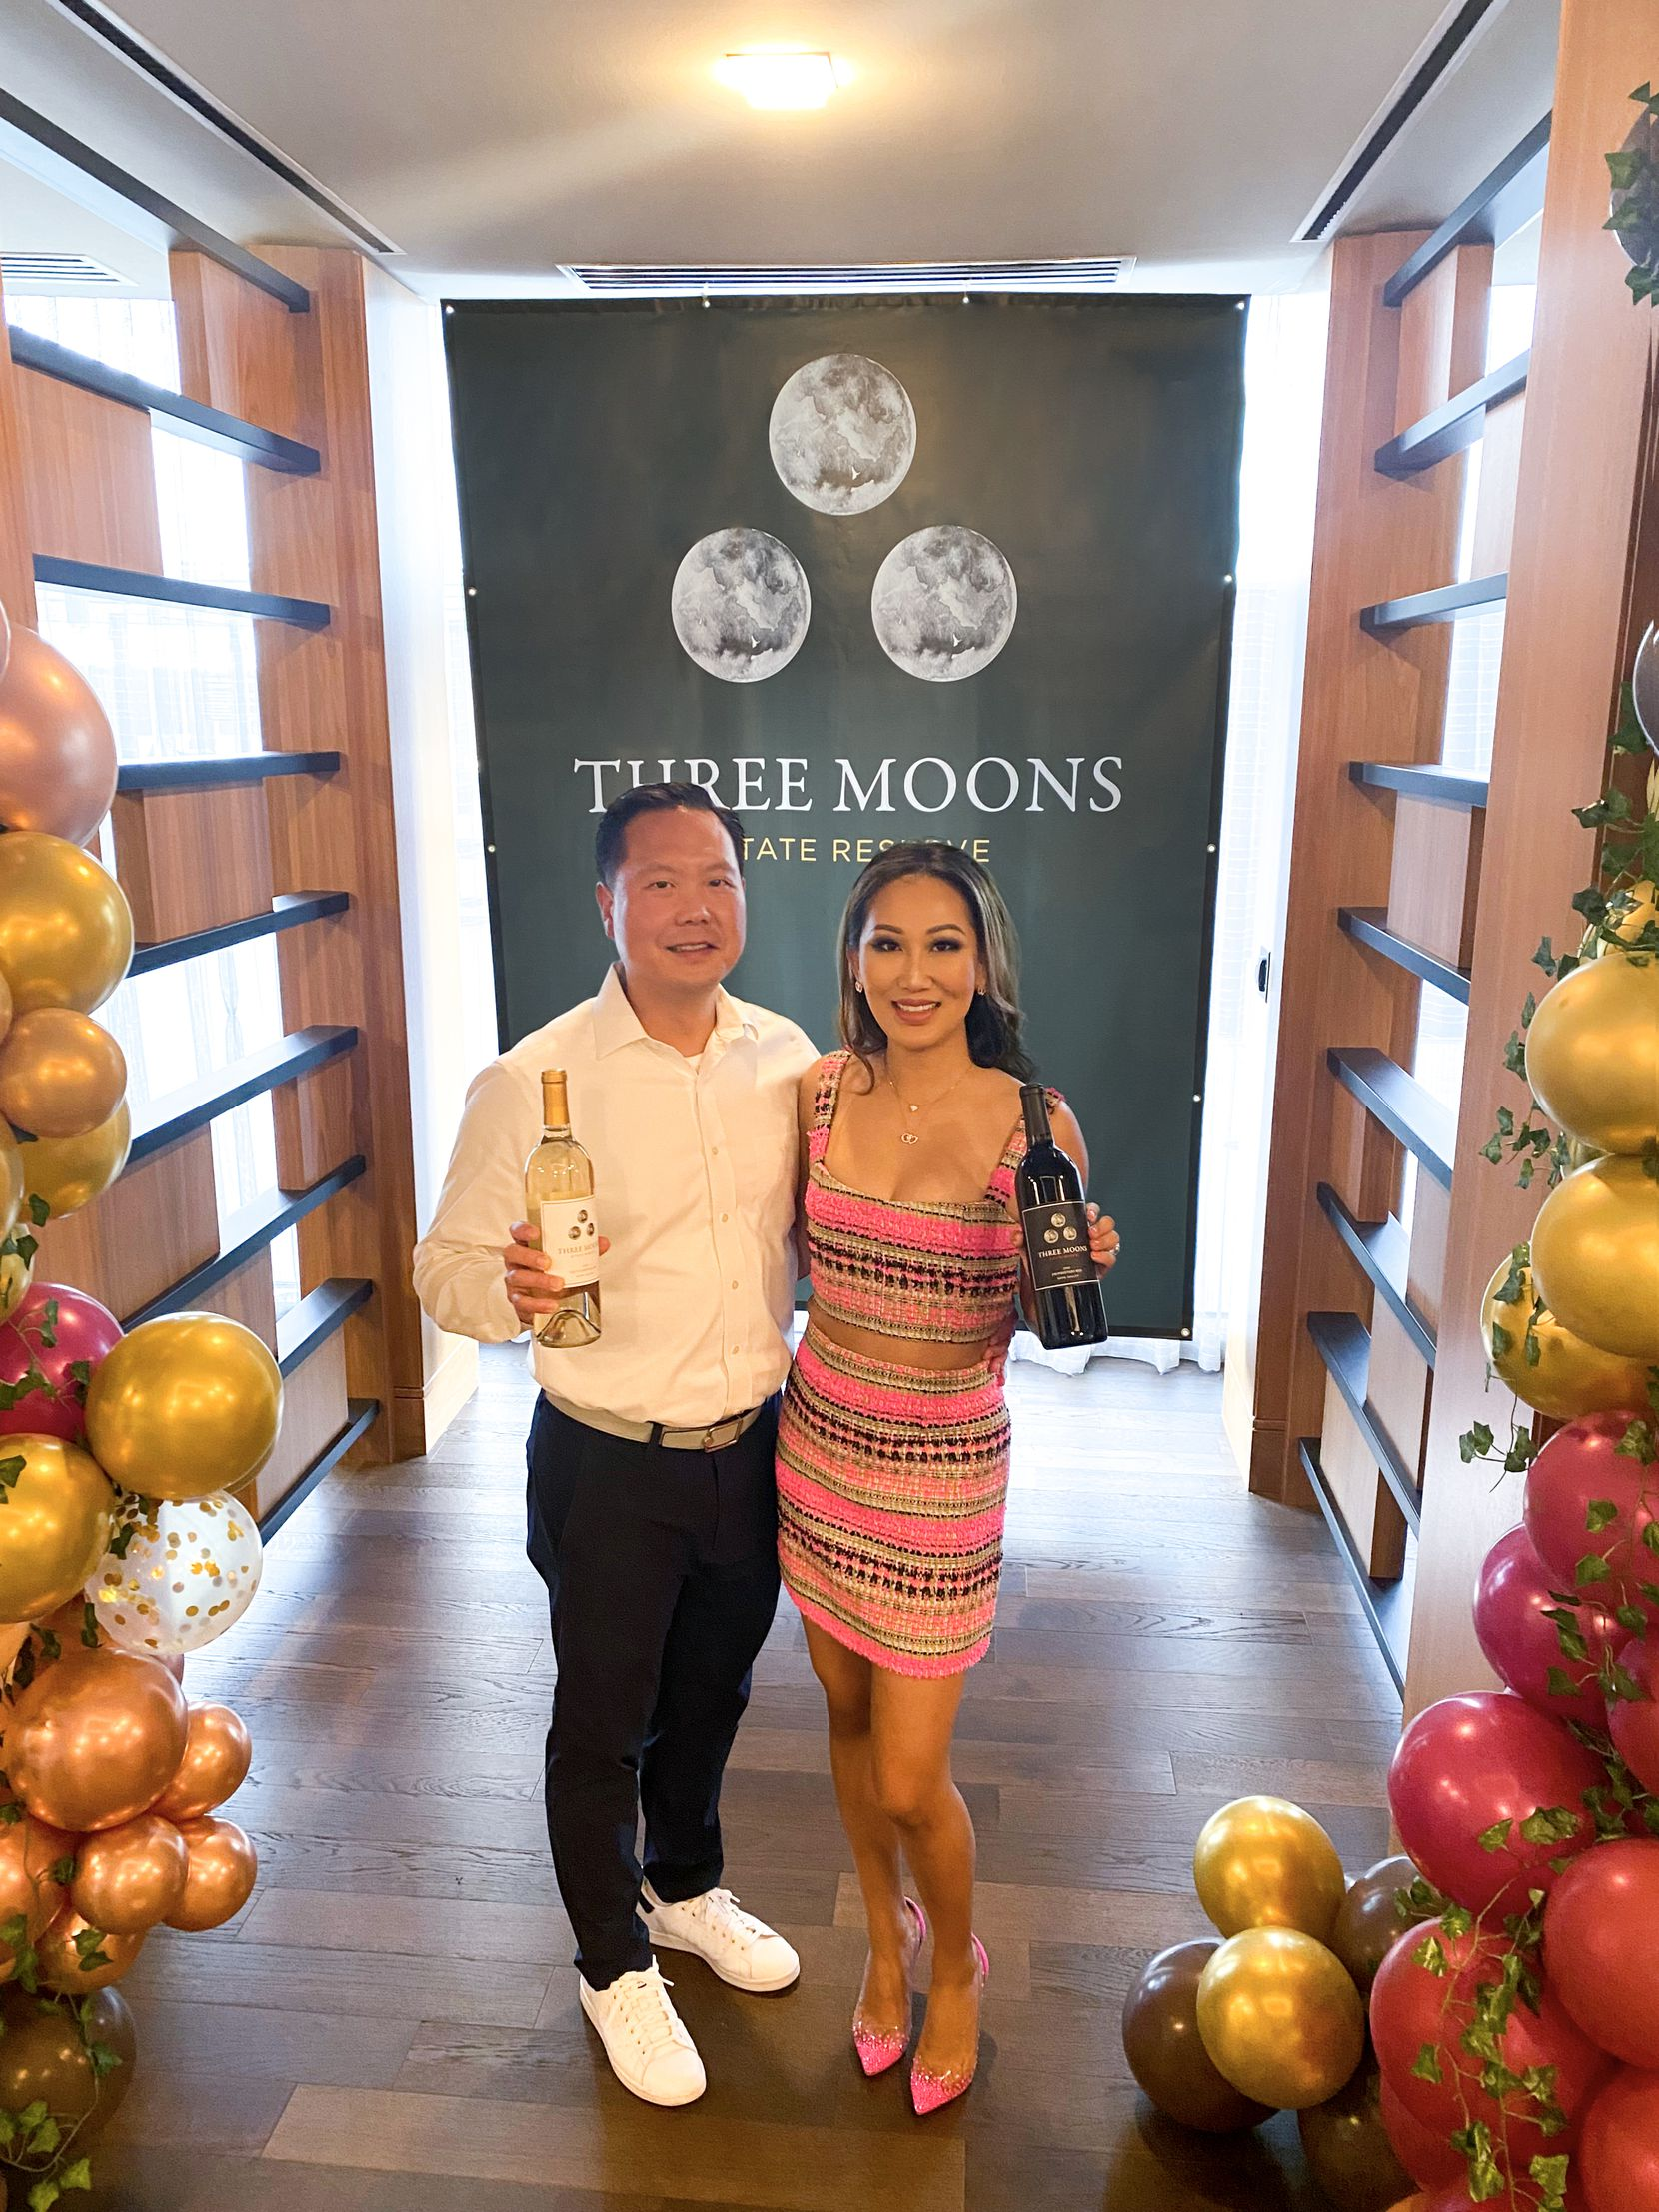 Daniel and Tiffany Moon launch Three Moons wine.